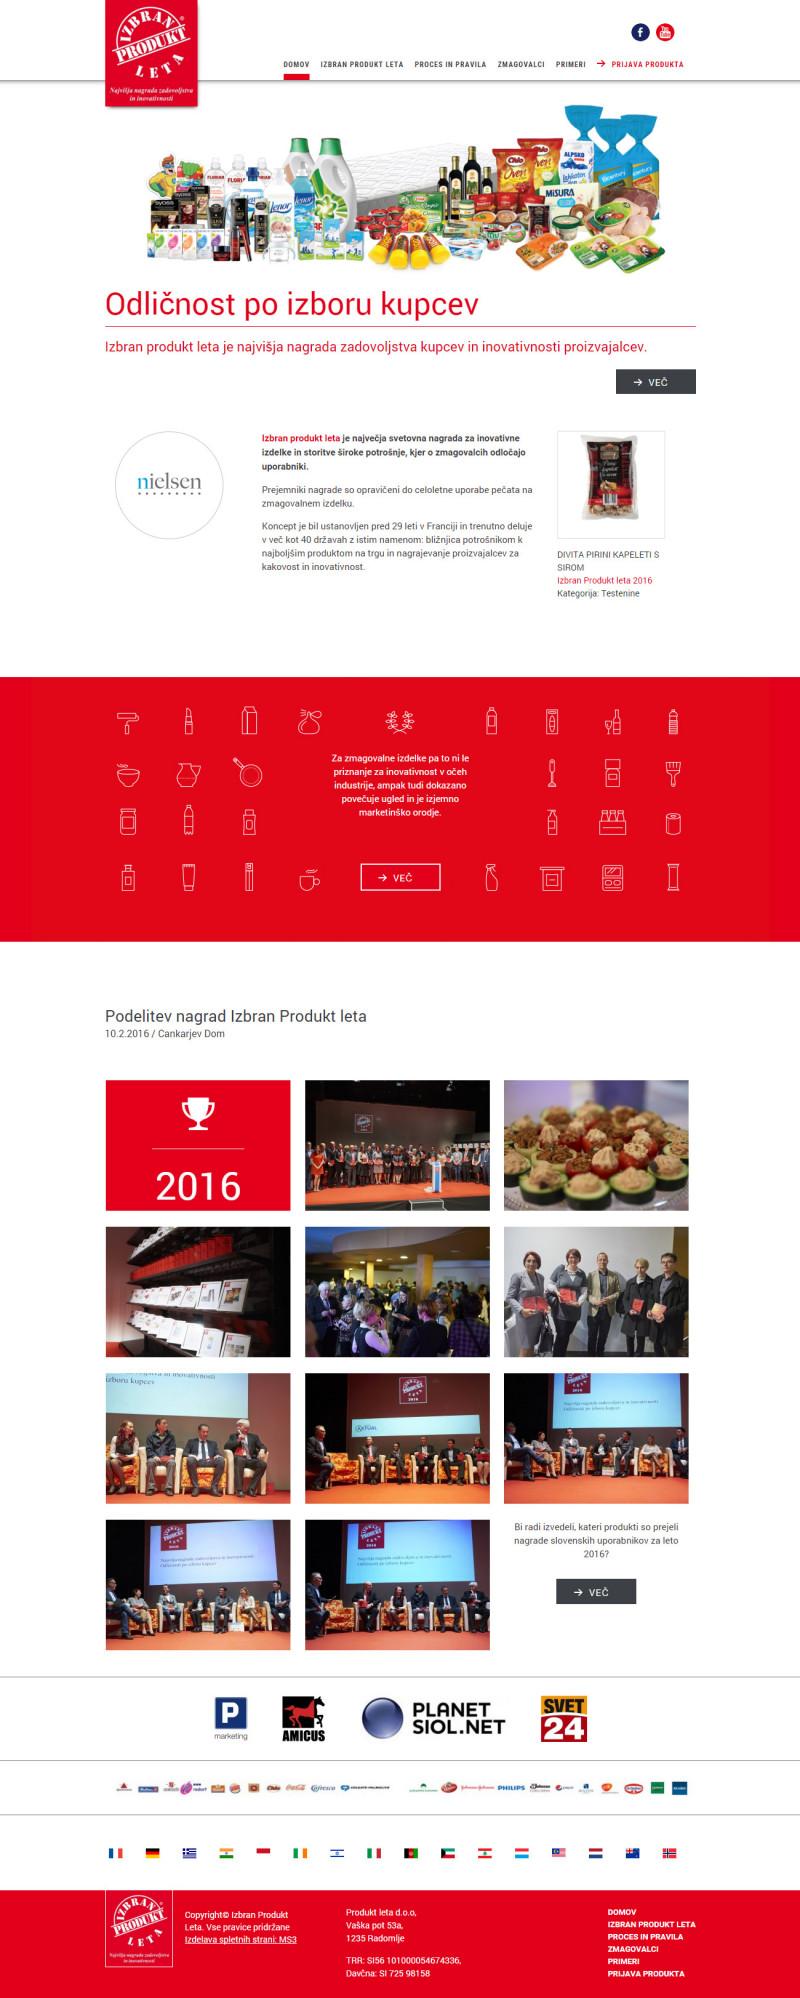 http://www.produktleta.si/